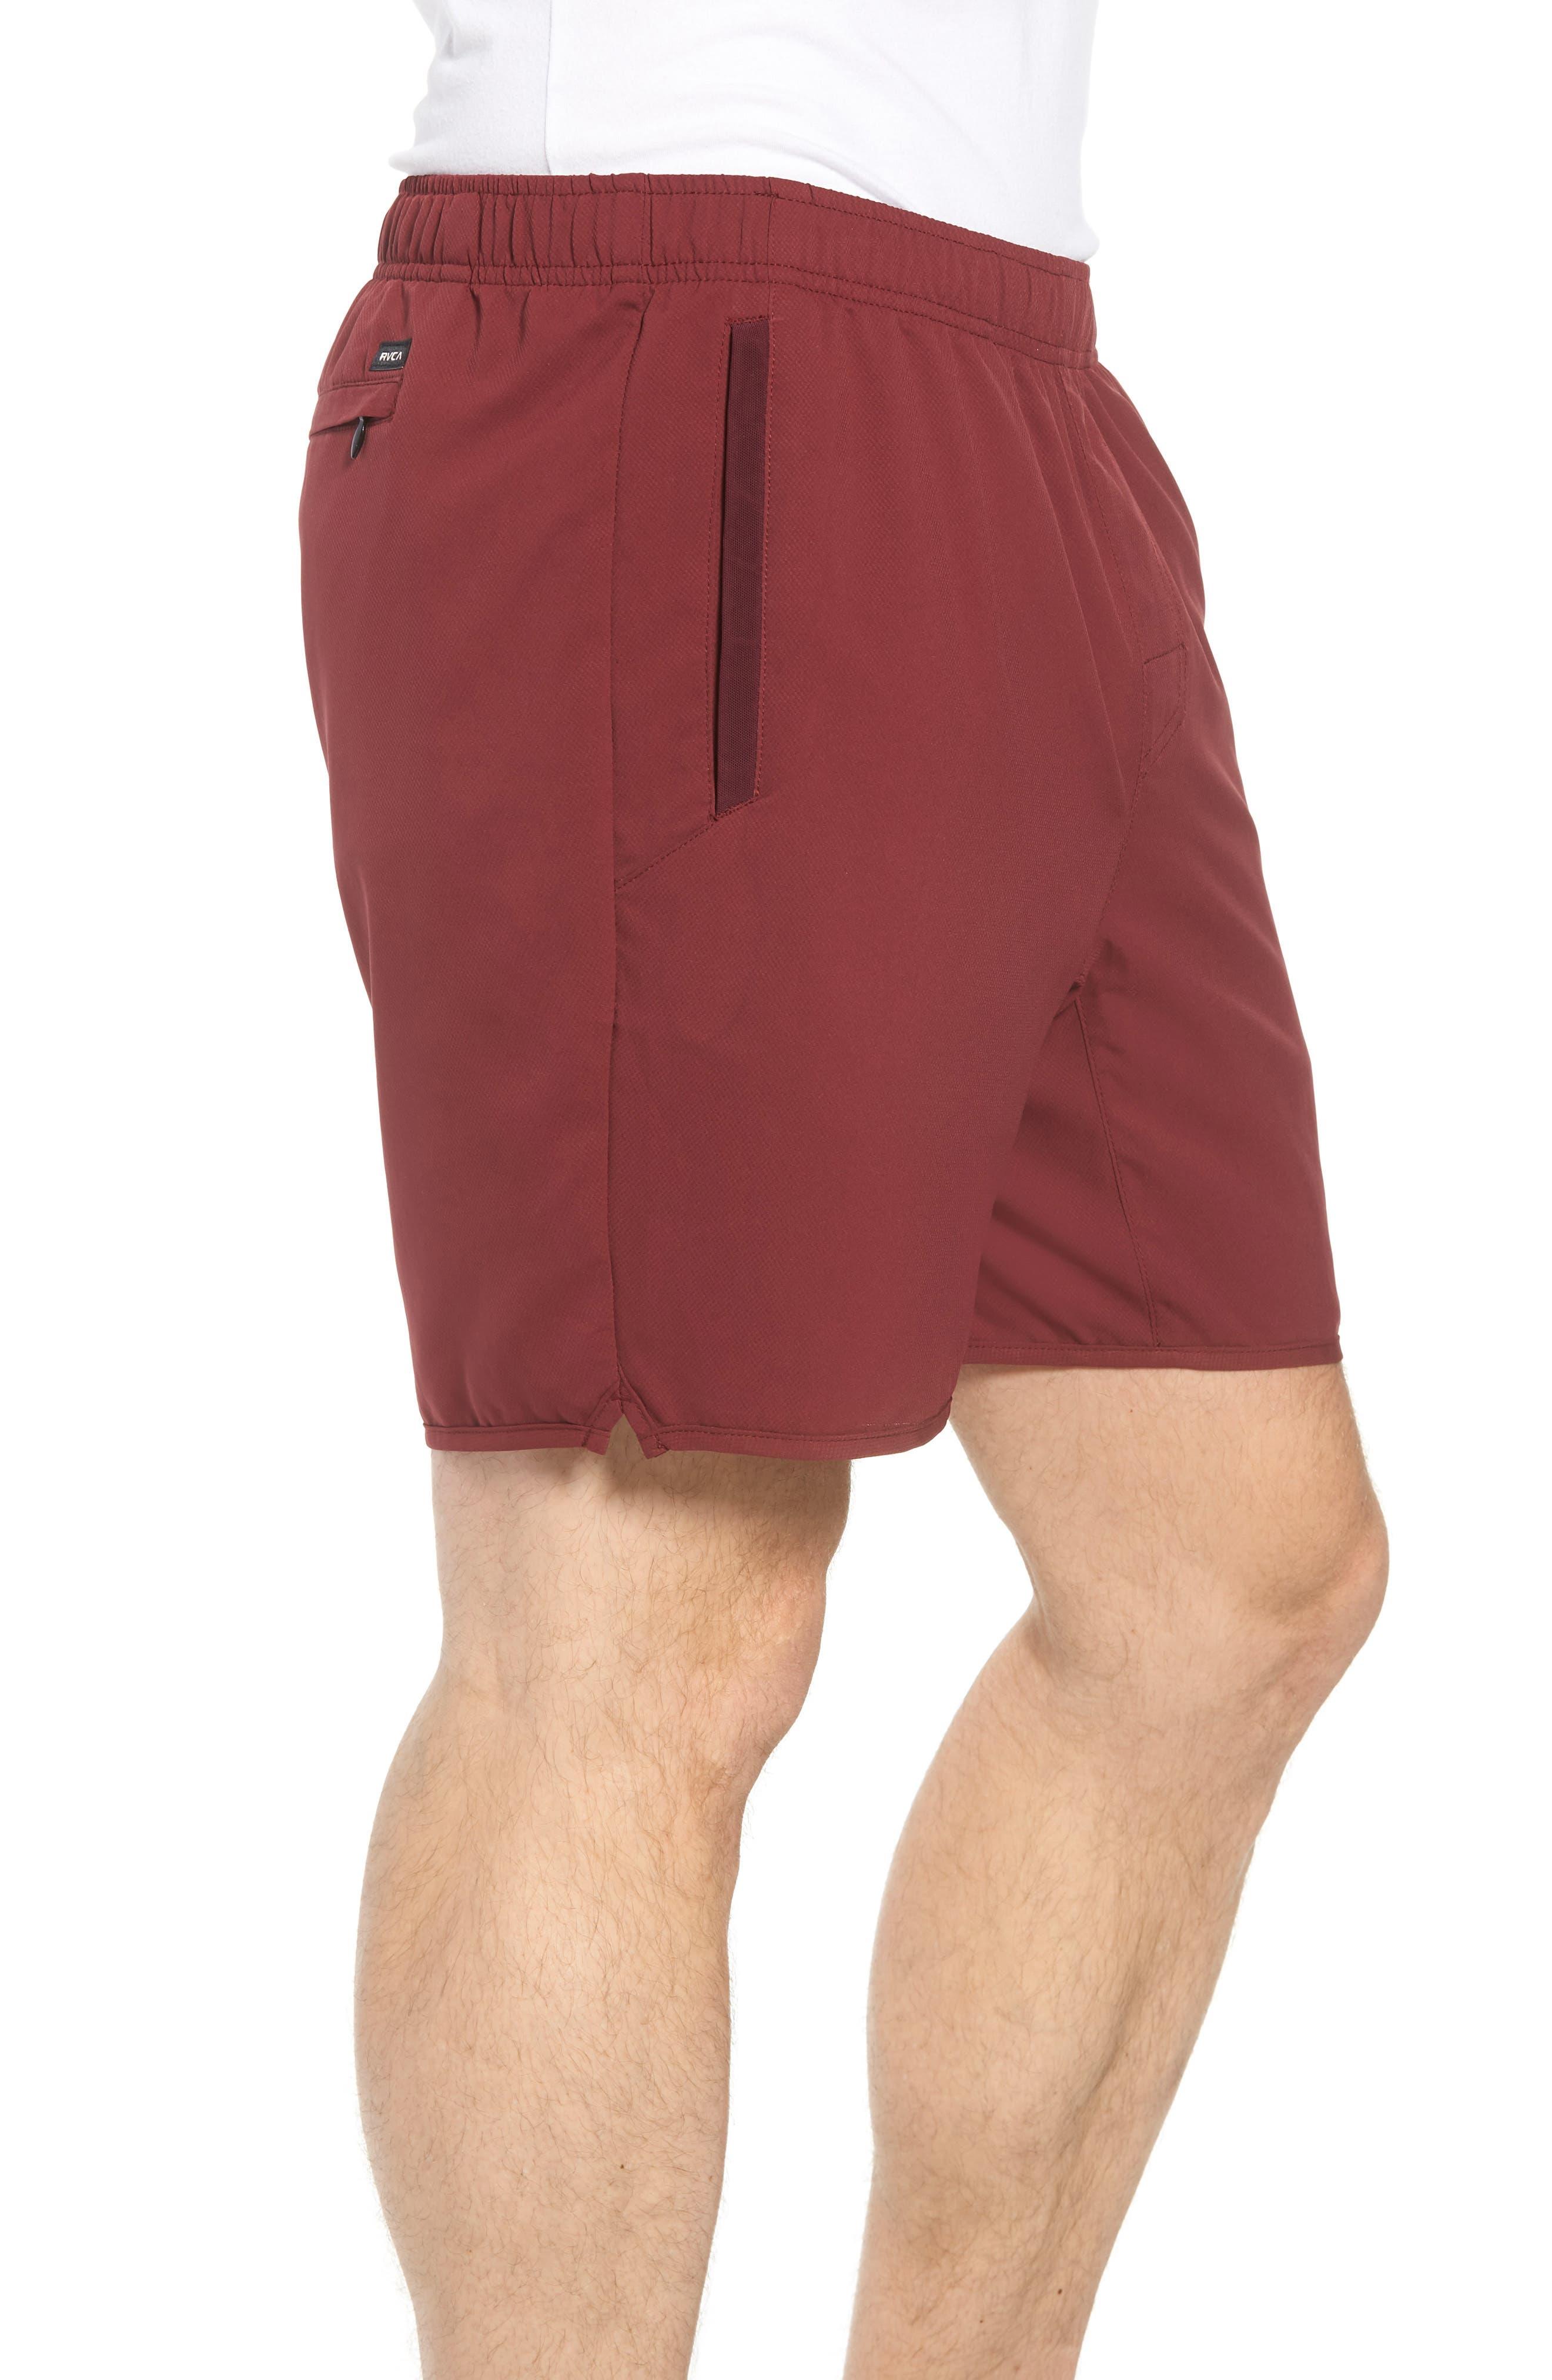 Yogger III Athletic Shorts,                             Alternate thumbnail 3, color,                             Tawny Port